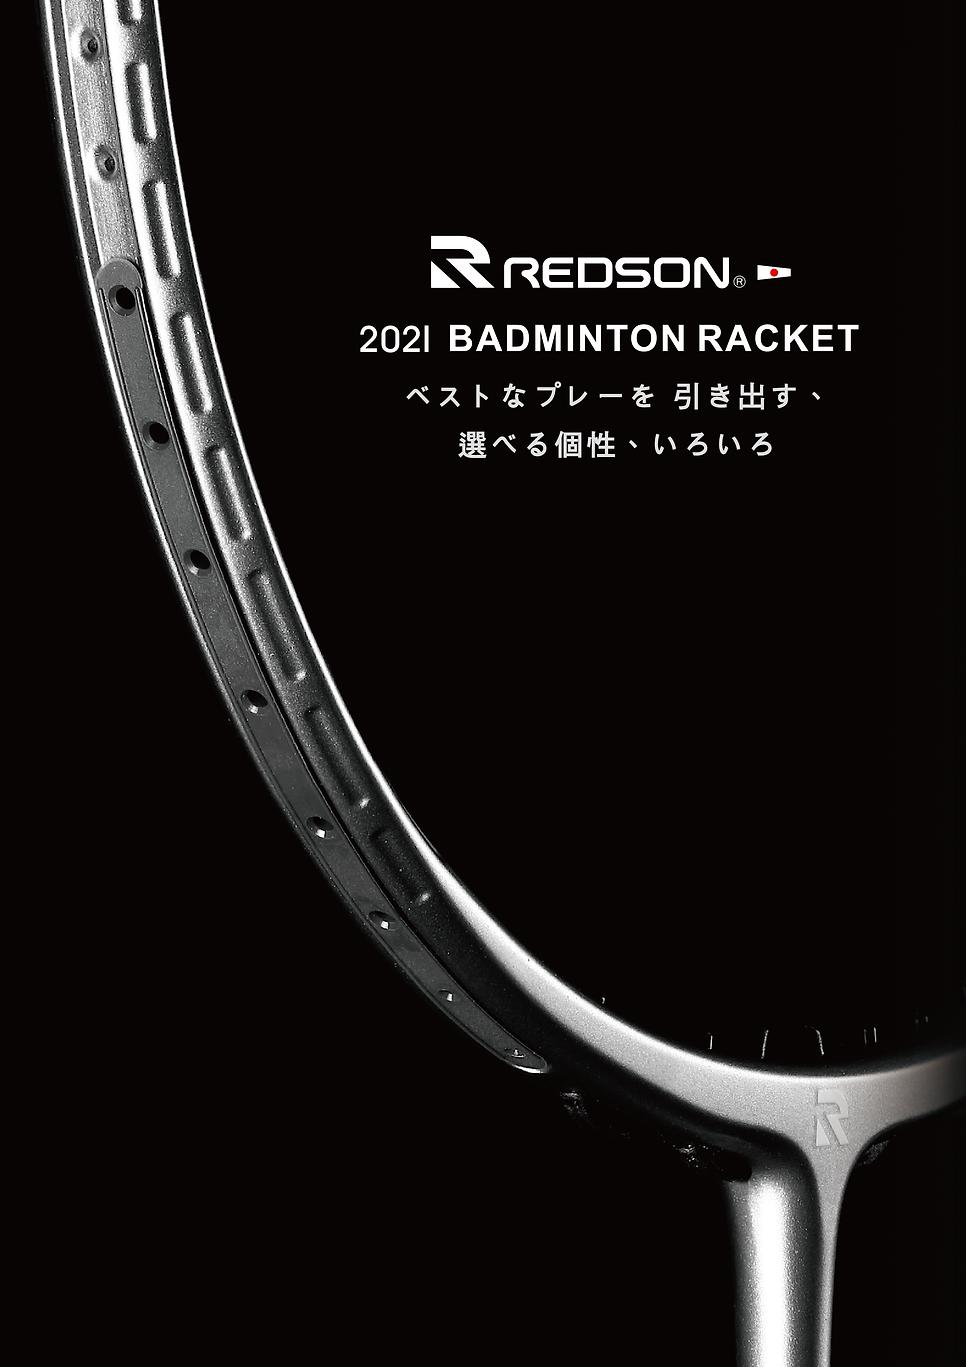 07.REDSON(TW)_Catalog 2021-全系列球拍區分表-01.p